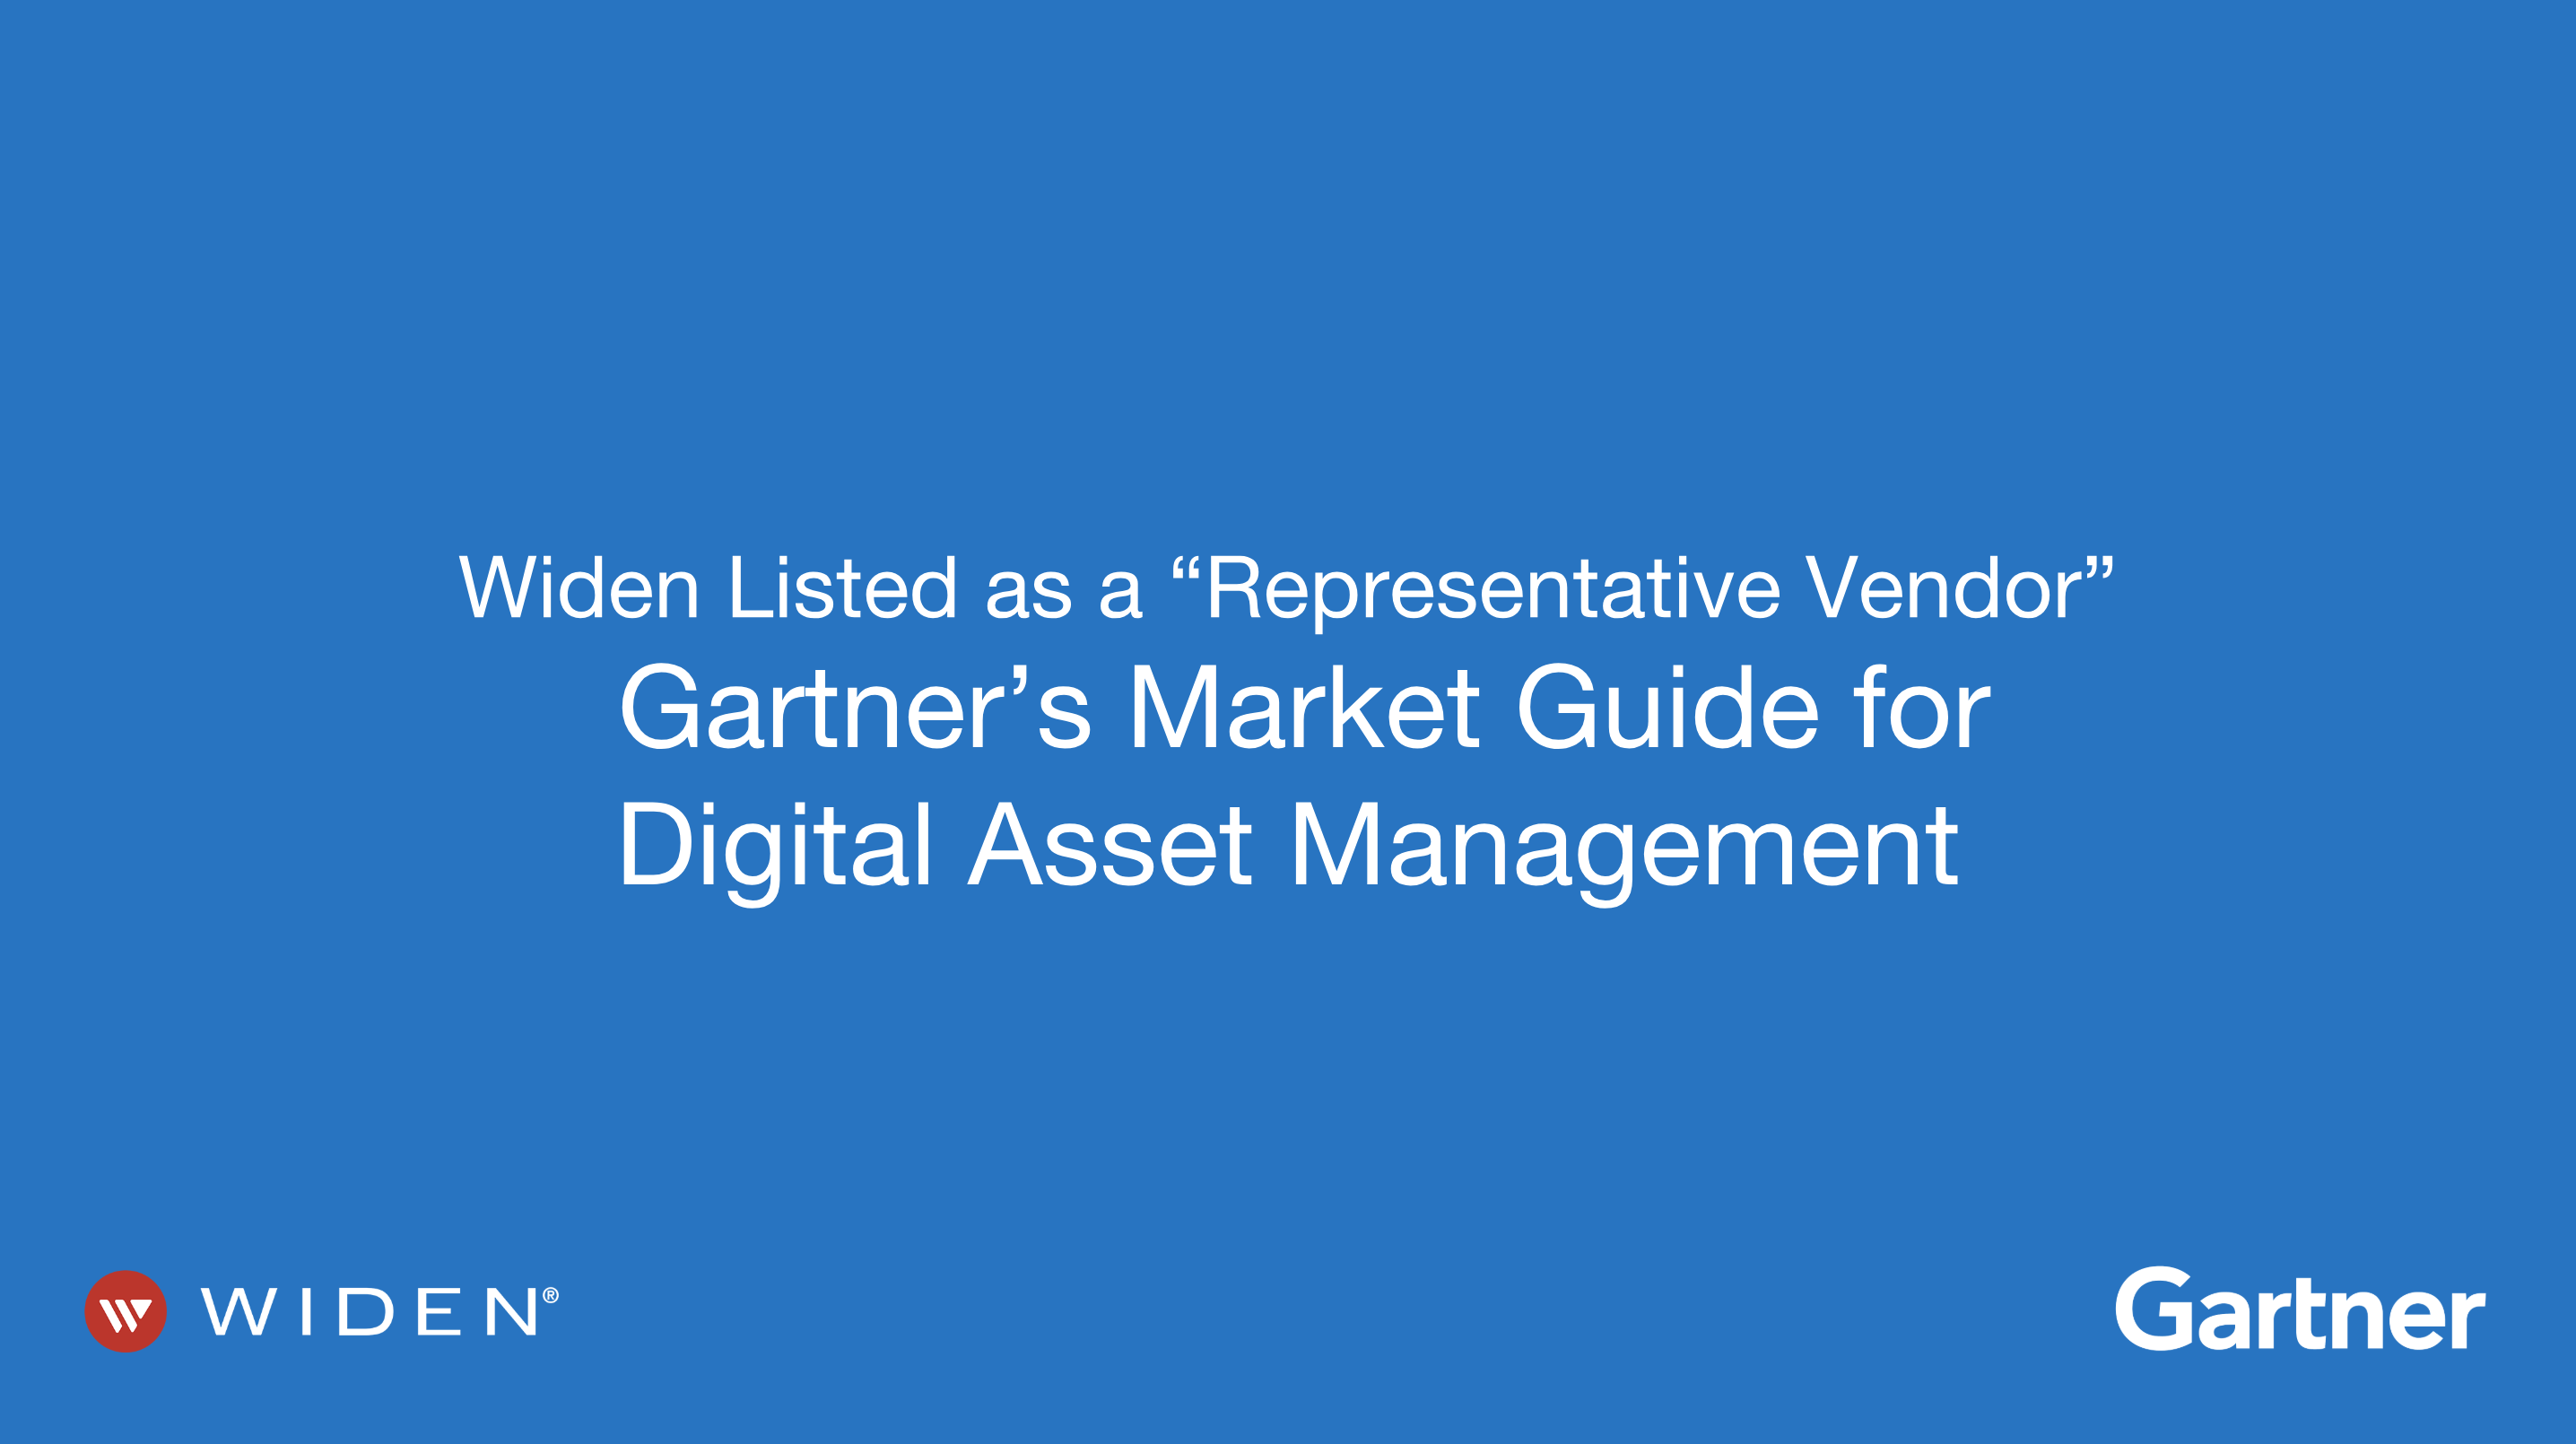 Widen Listed as a Representative Vendor